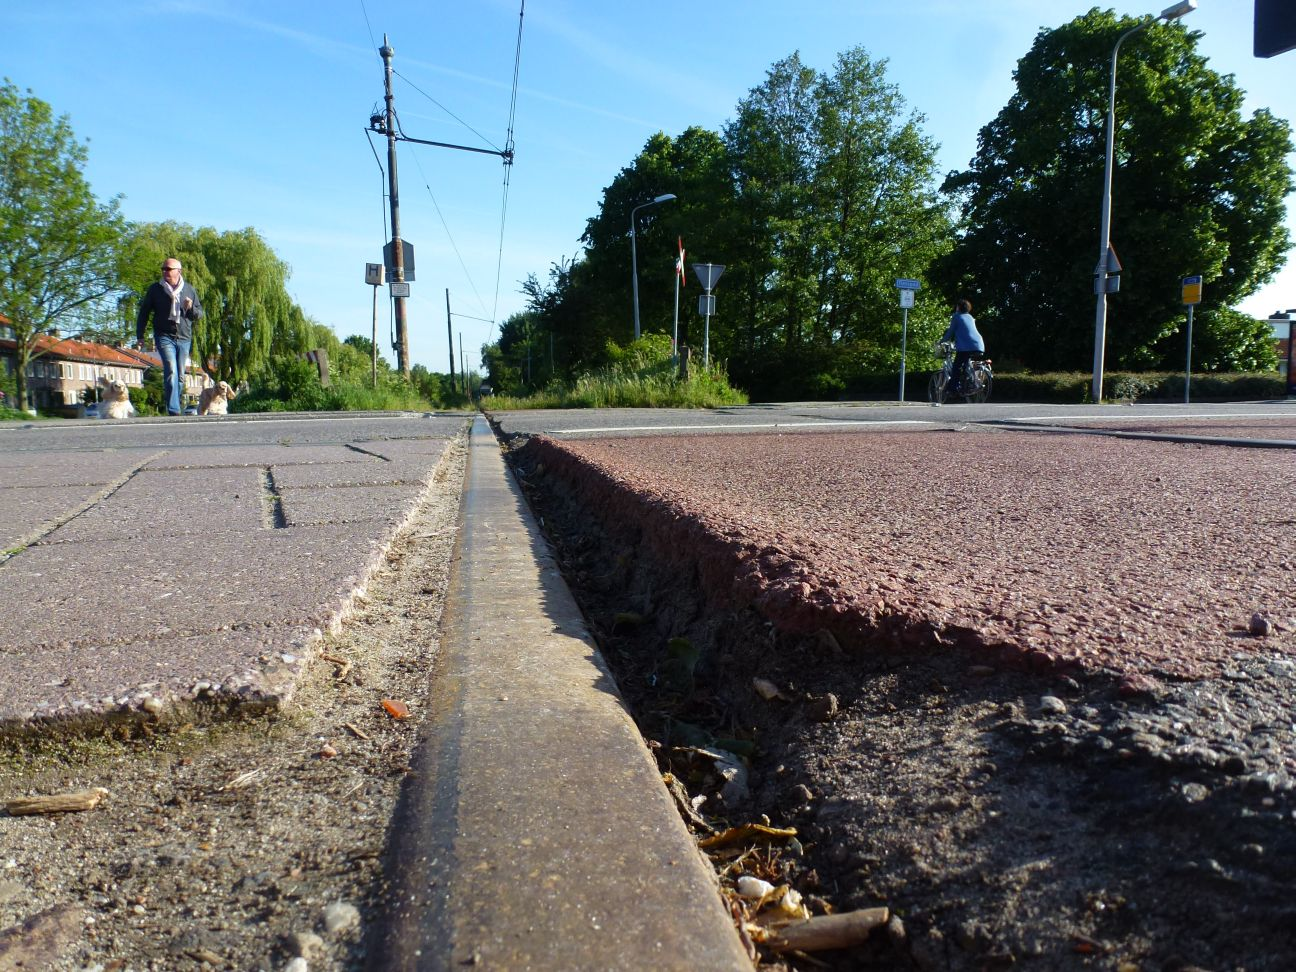 asfalt tramrails